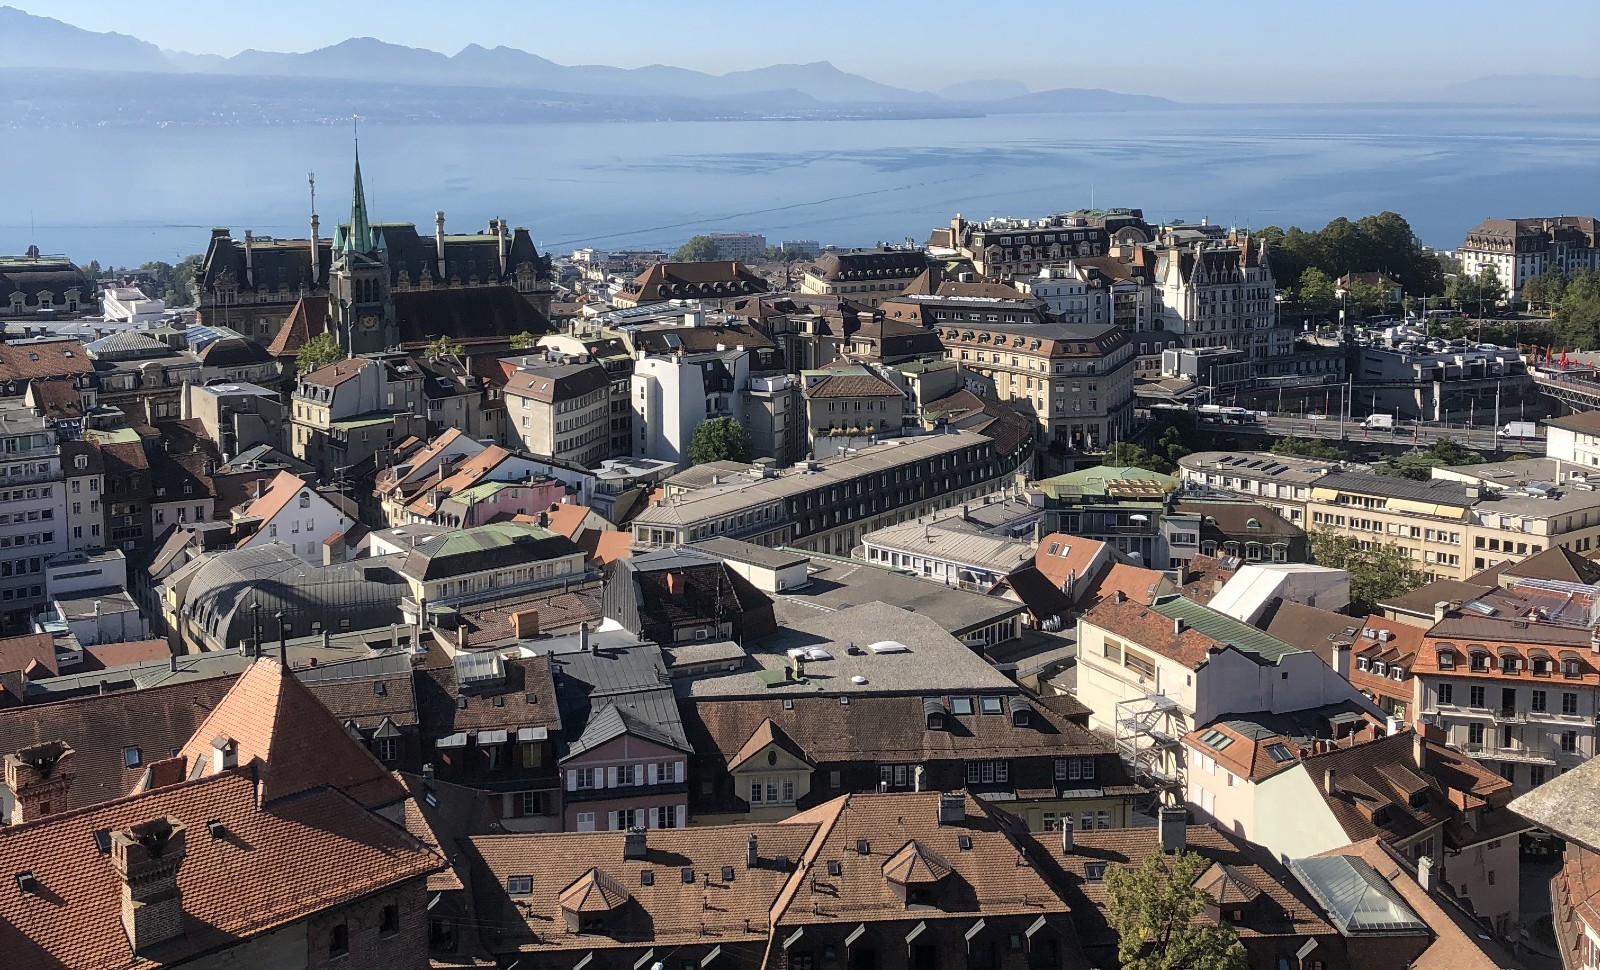 Lausanne Image: Sophie ML / Pixabay